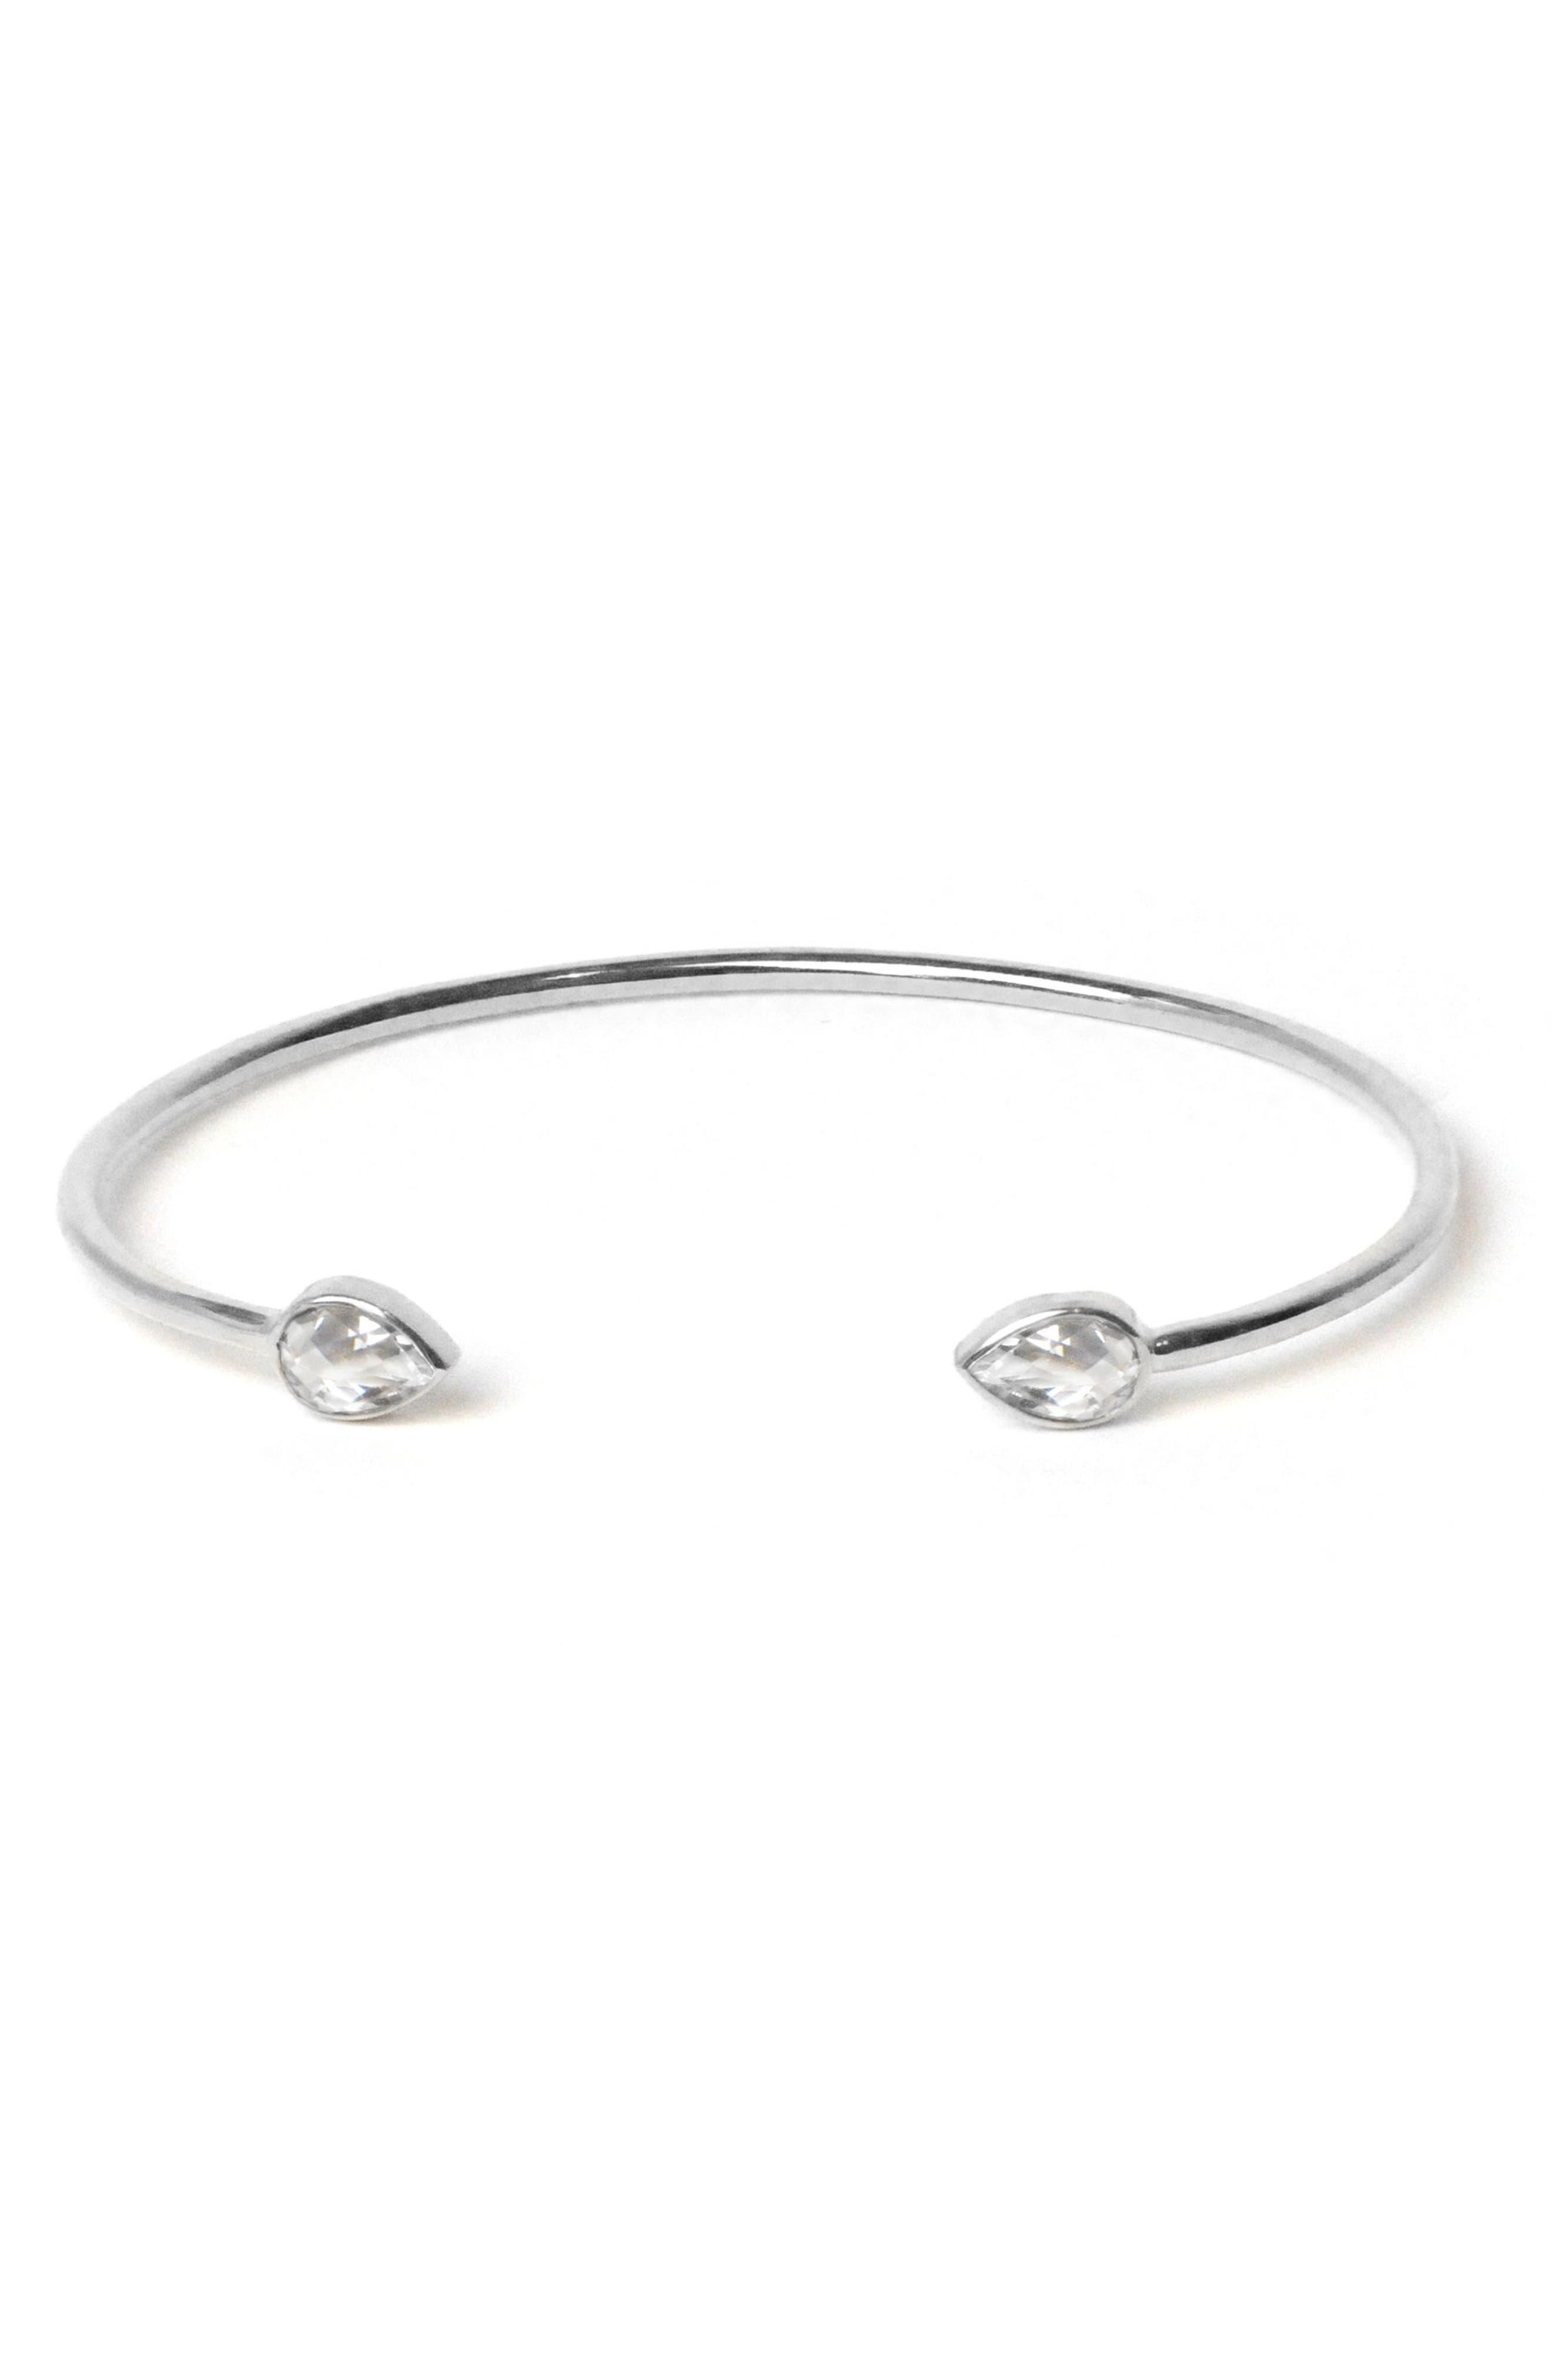 White Topaz Cuff Bracelet,                         Main,                         color, White Topaz